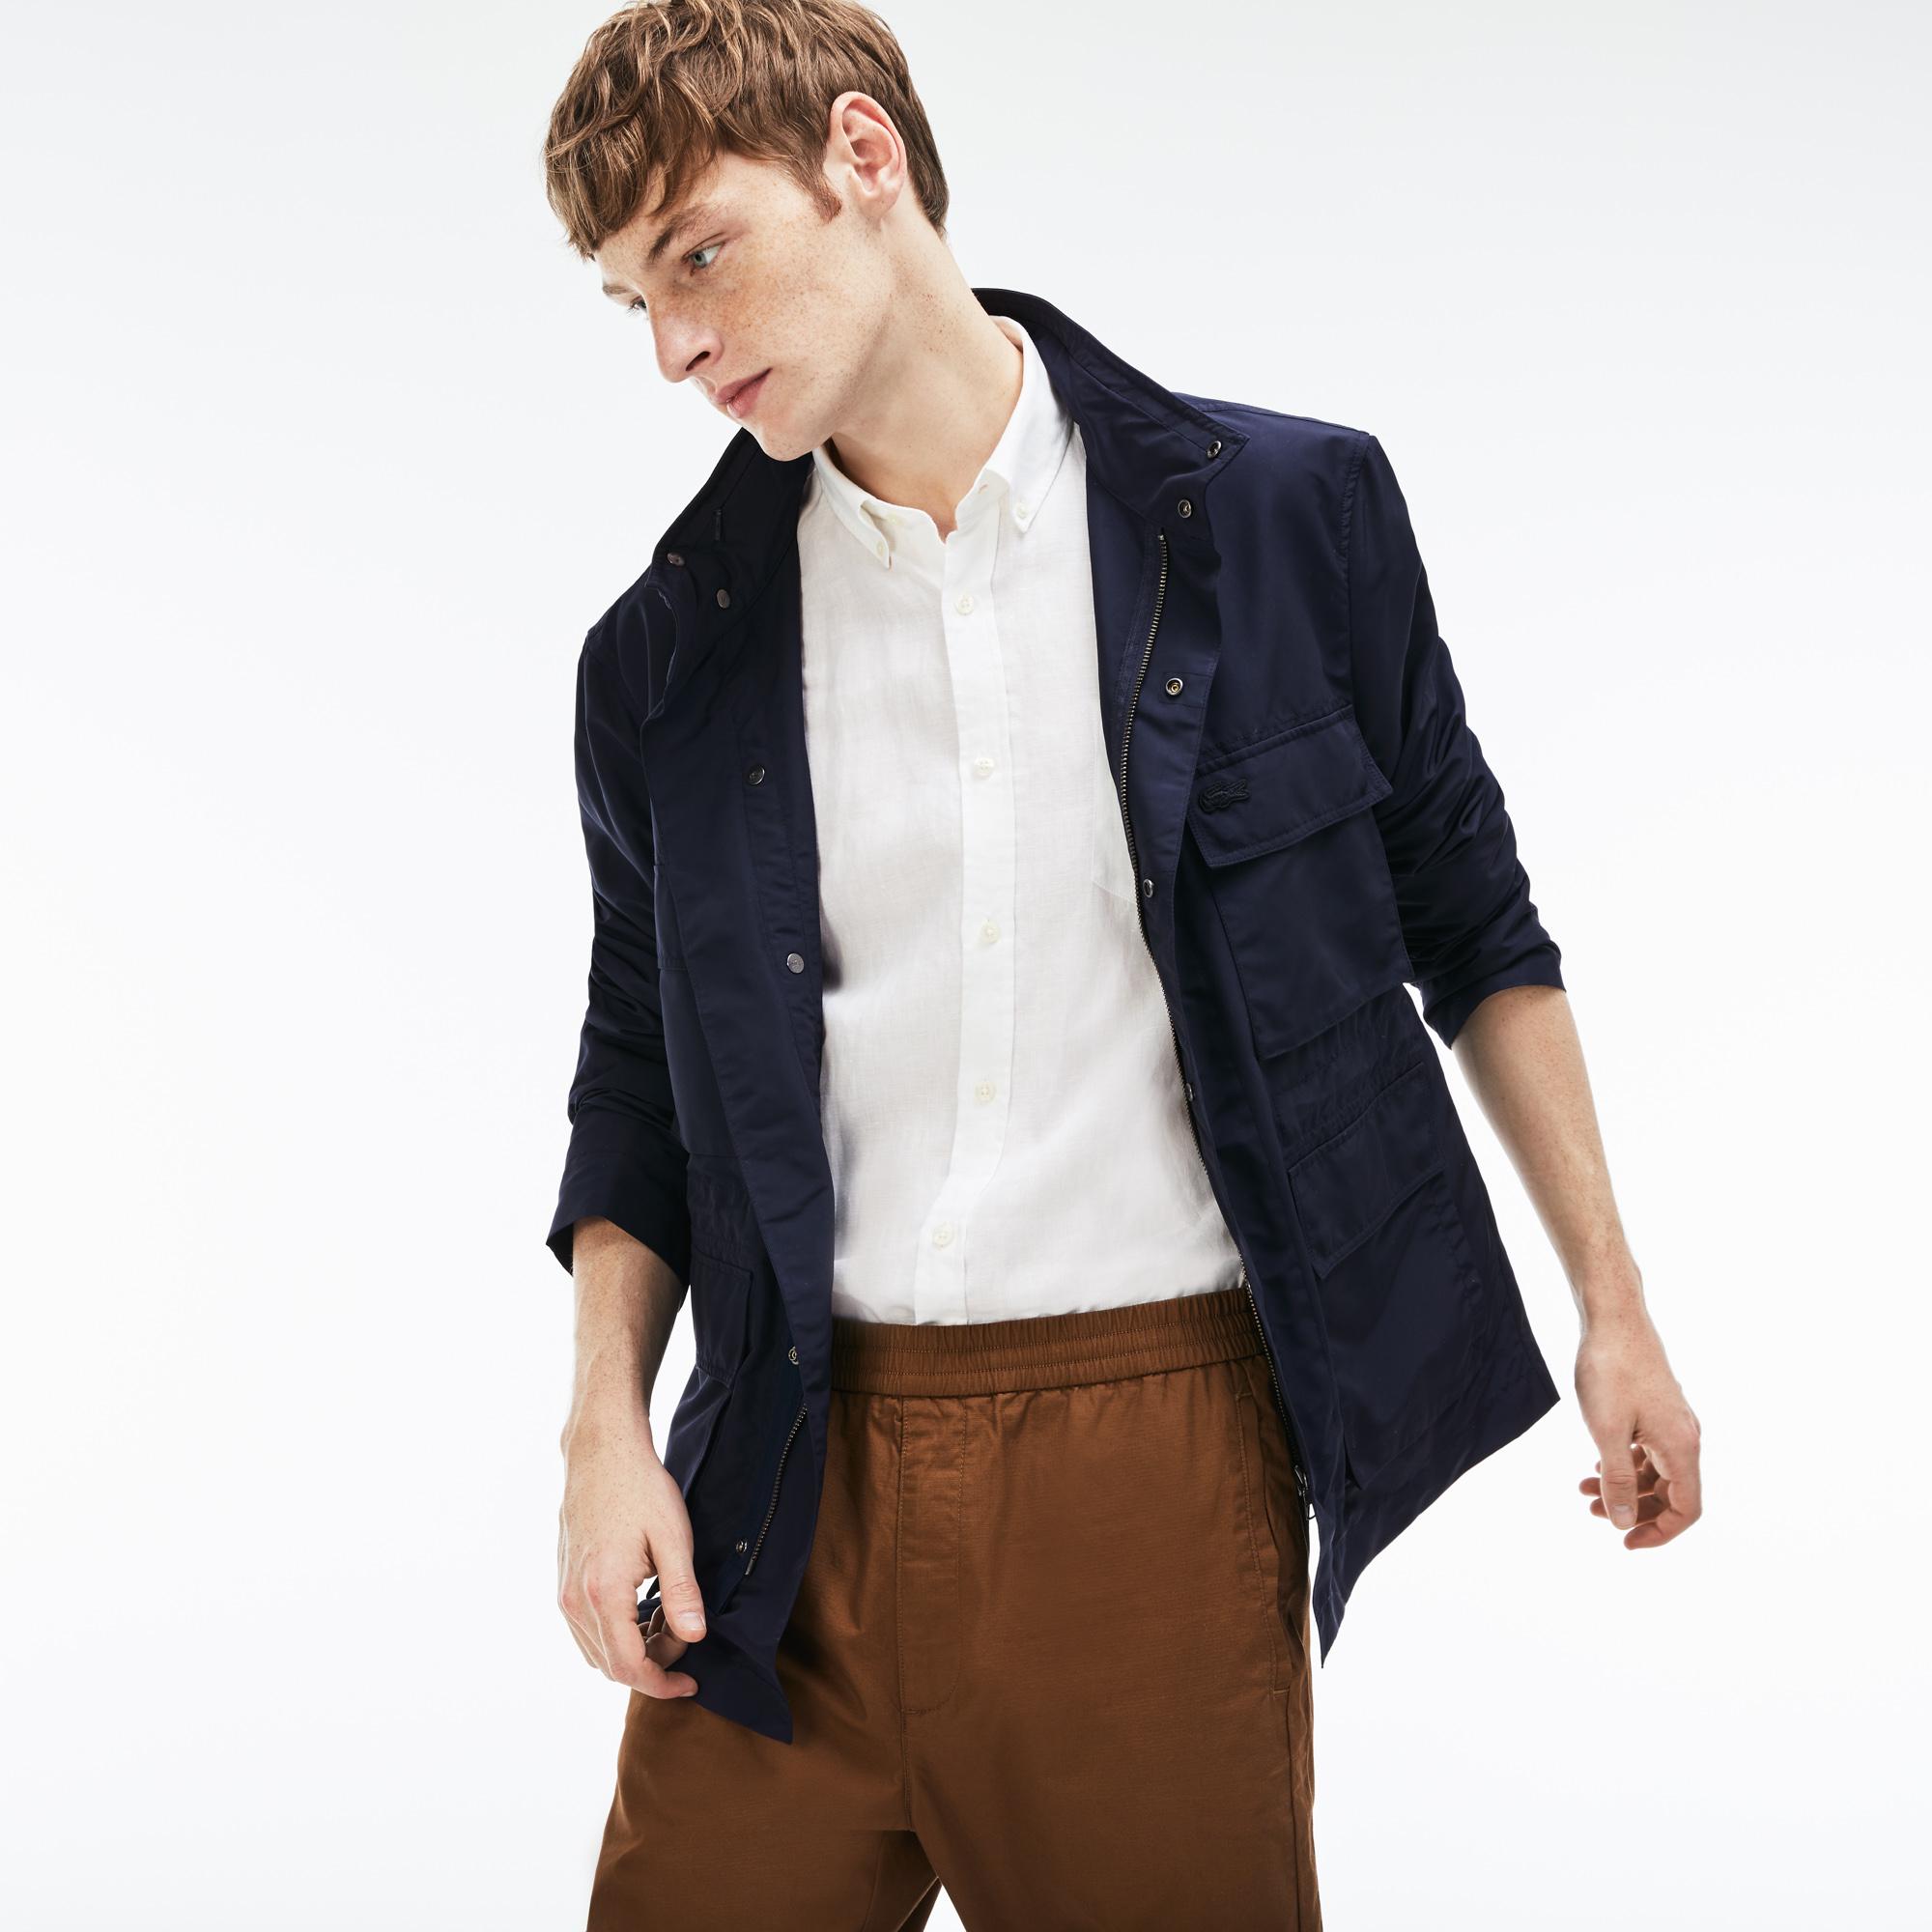 Купить Куртка Lacoste, синий, BH3928